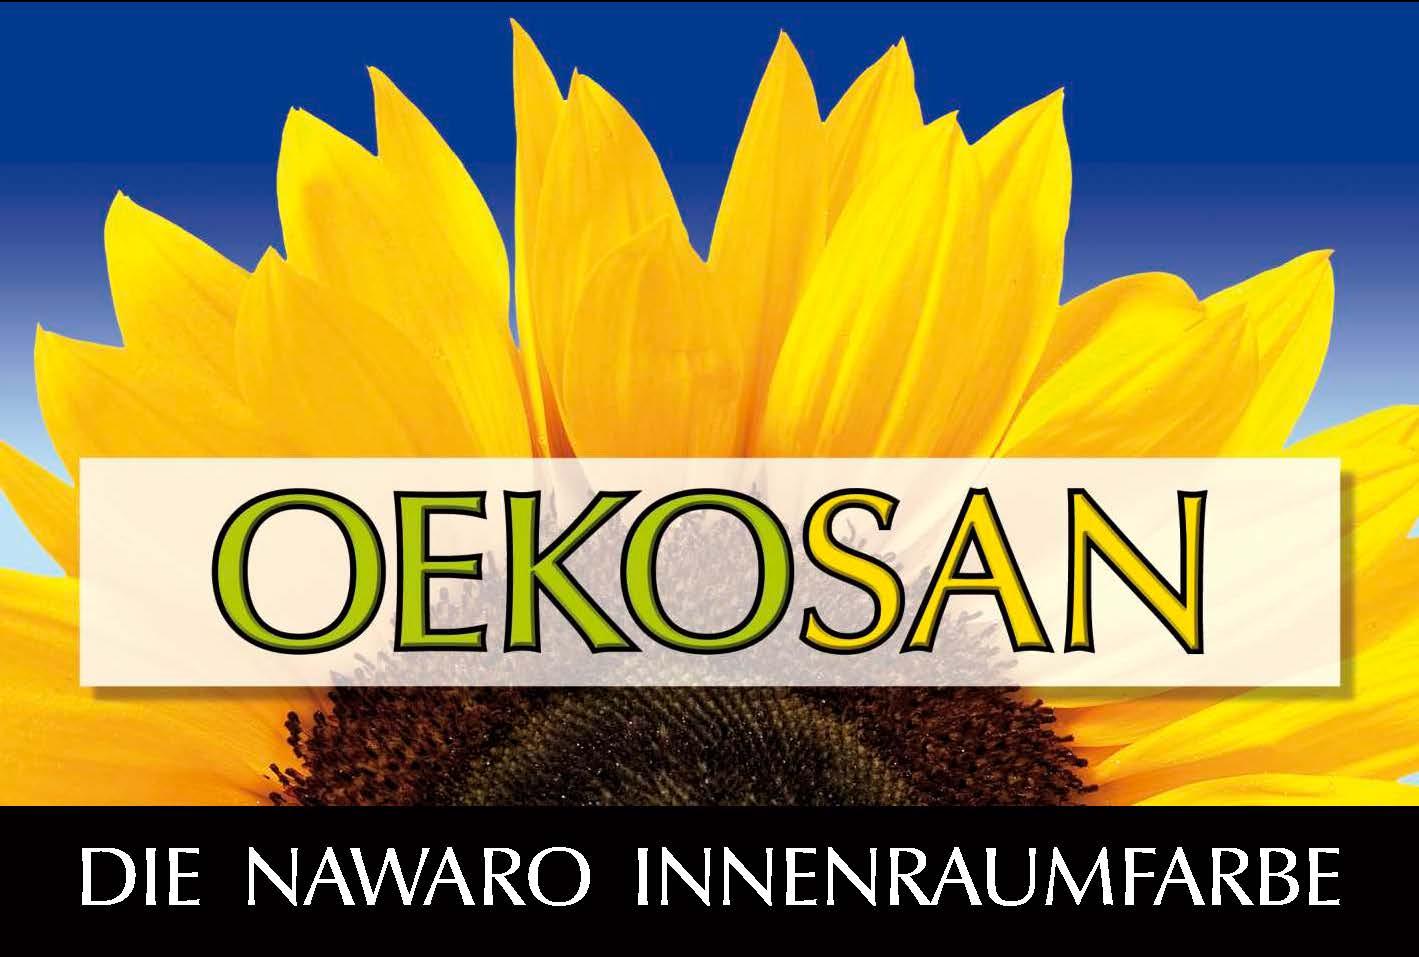 OekoSan  -  Die NAWARO Innenraumfarbe